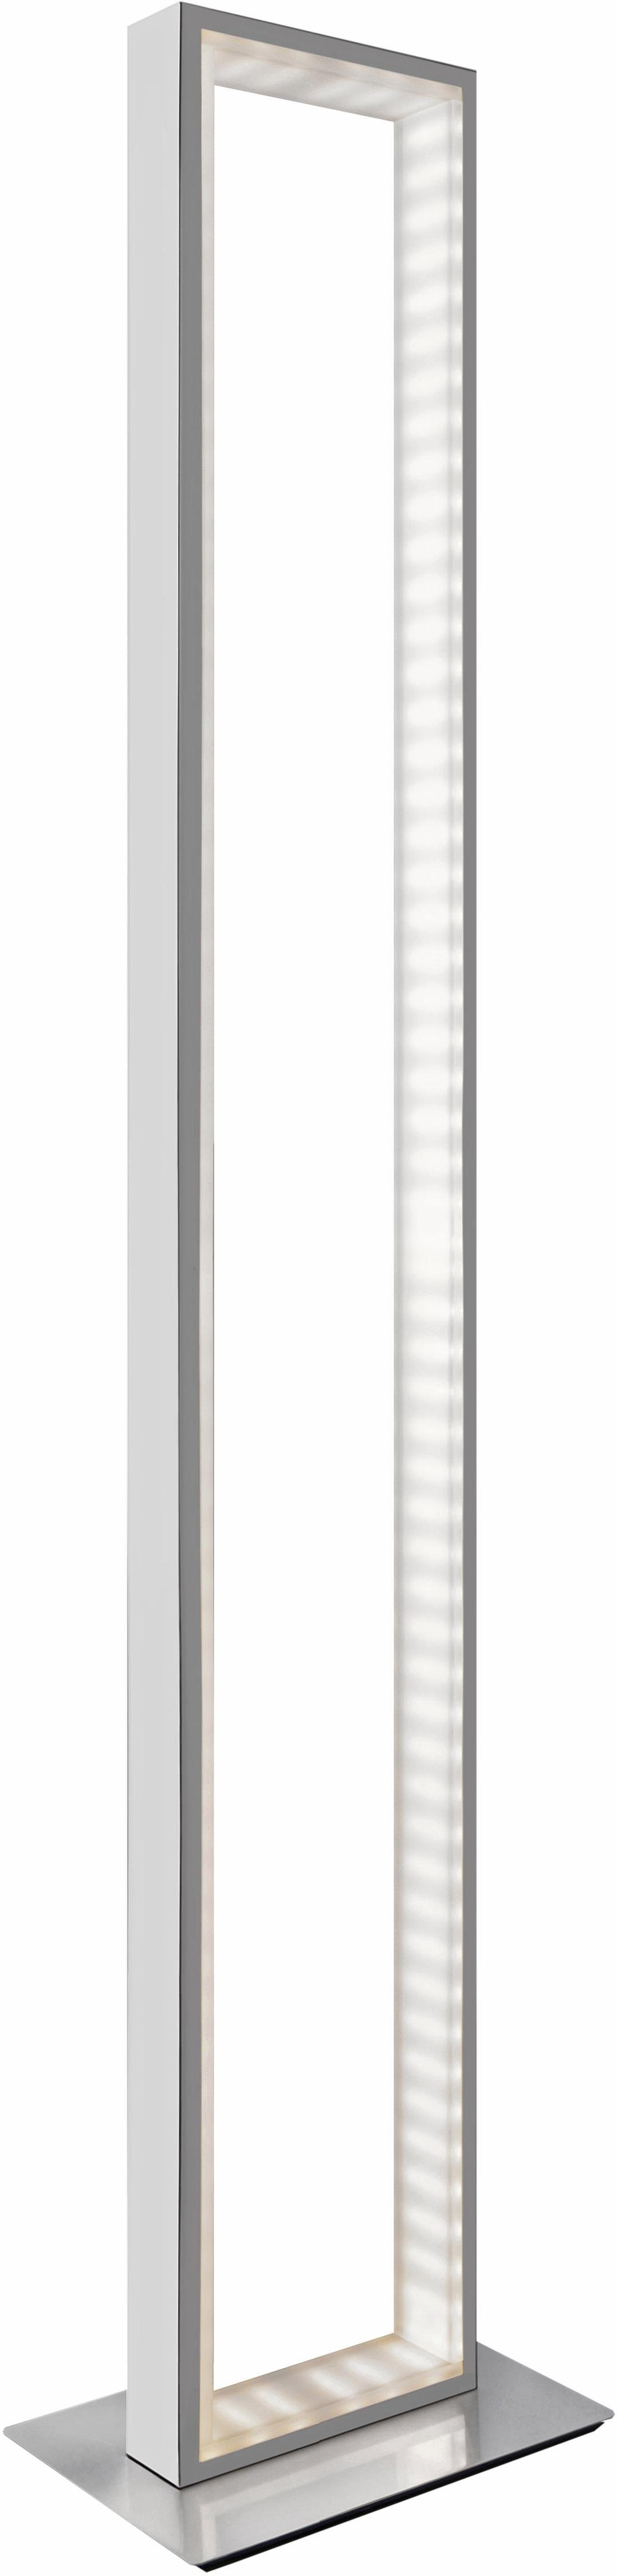 SOMPEX LED Stehlampe »Otti«